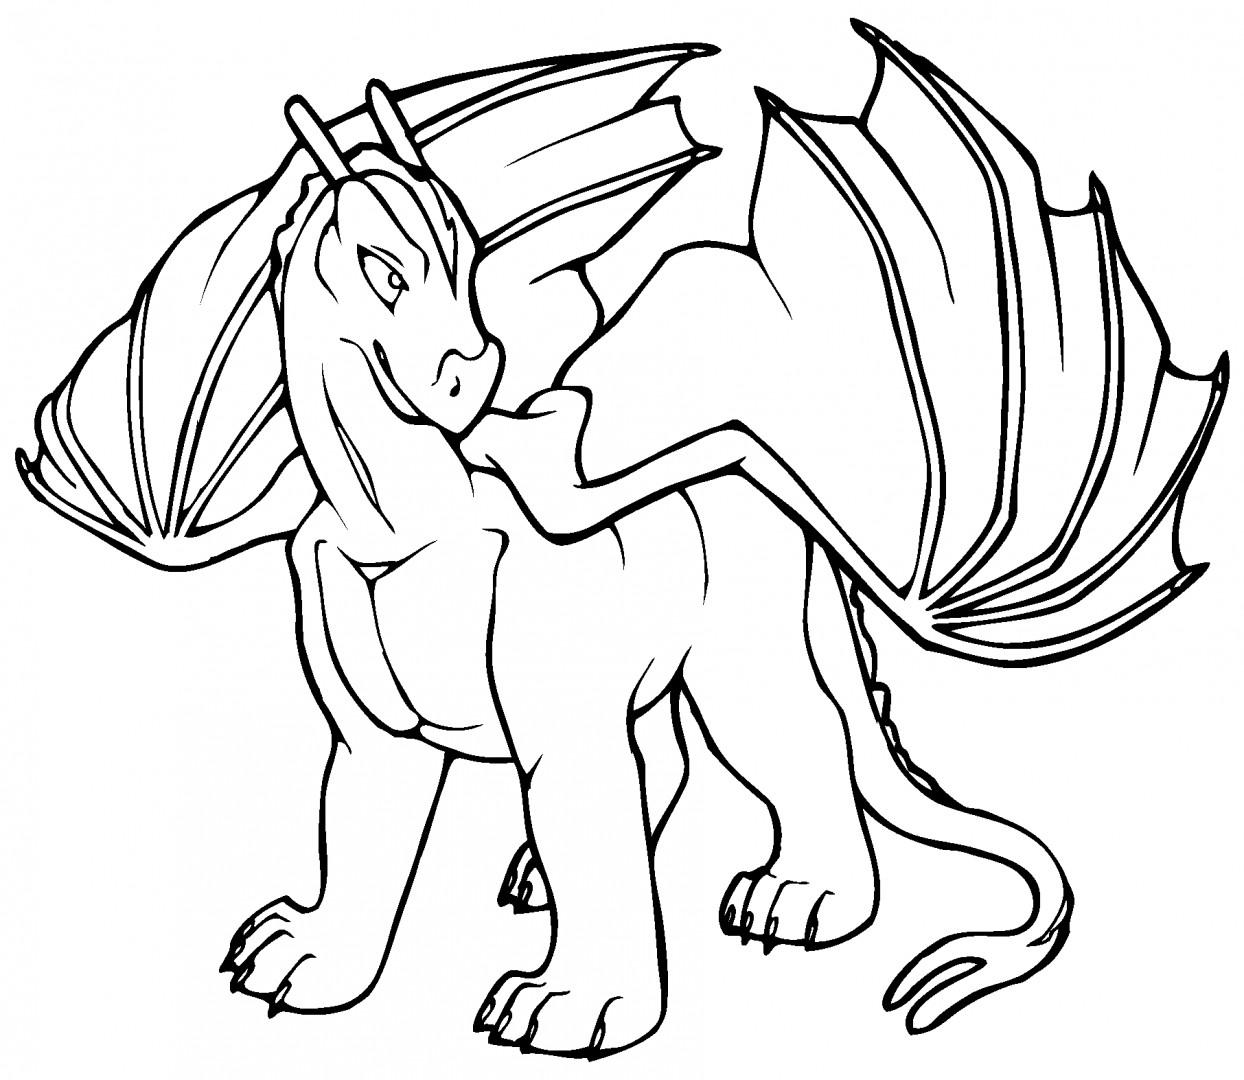 Best ideas about Boys Trace Printable Coloring Sheets . Save or Pin Desenhos para pintar de dragões Now.